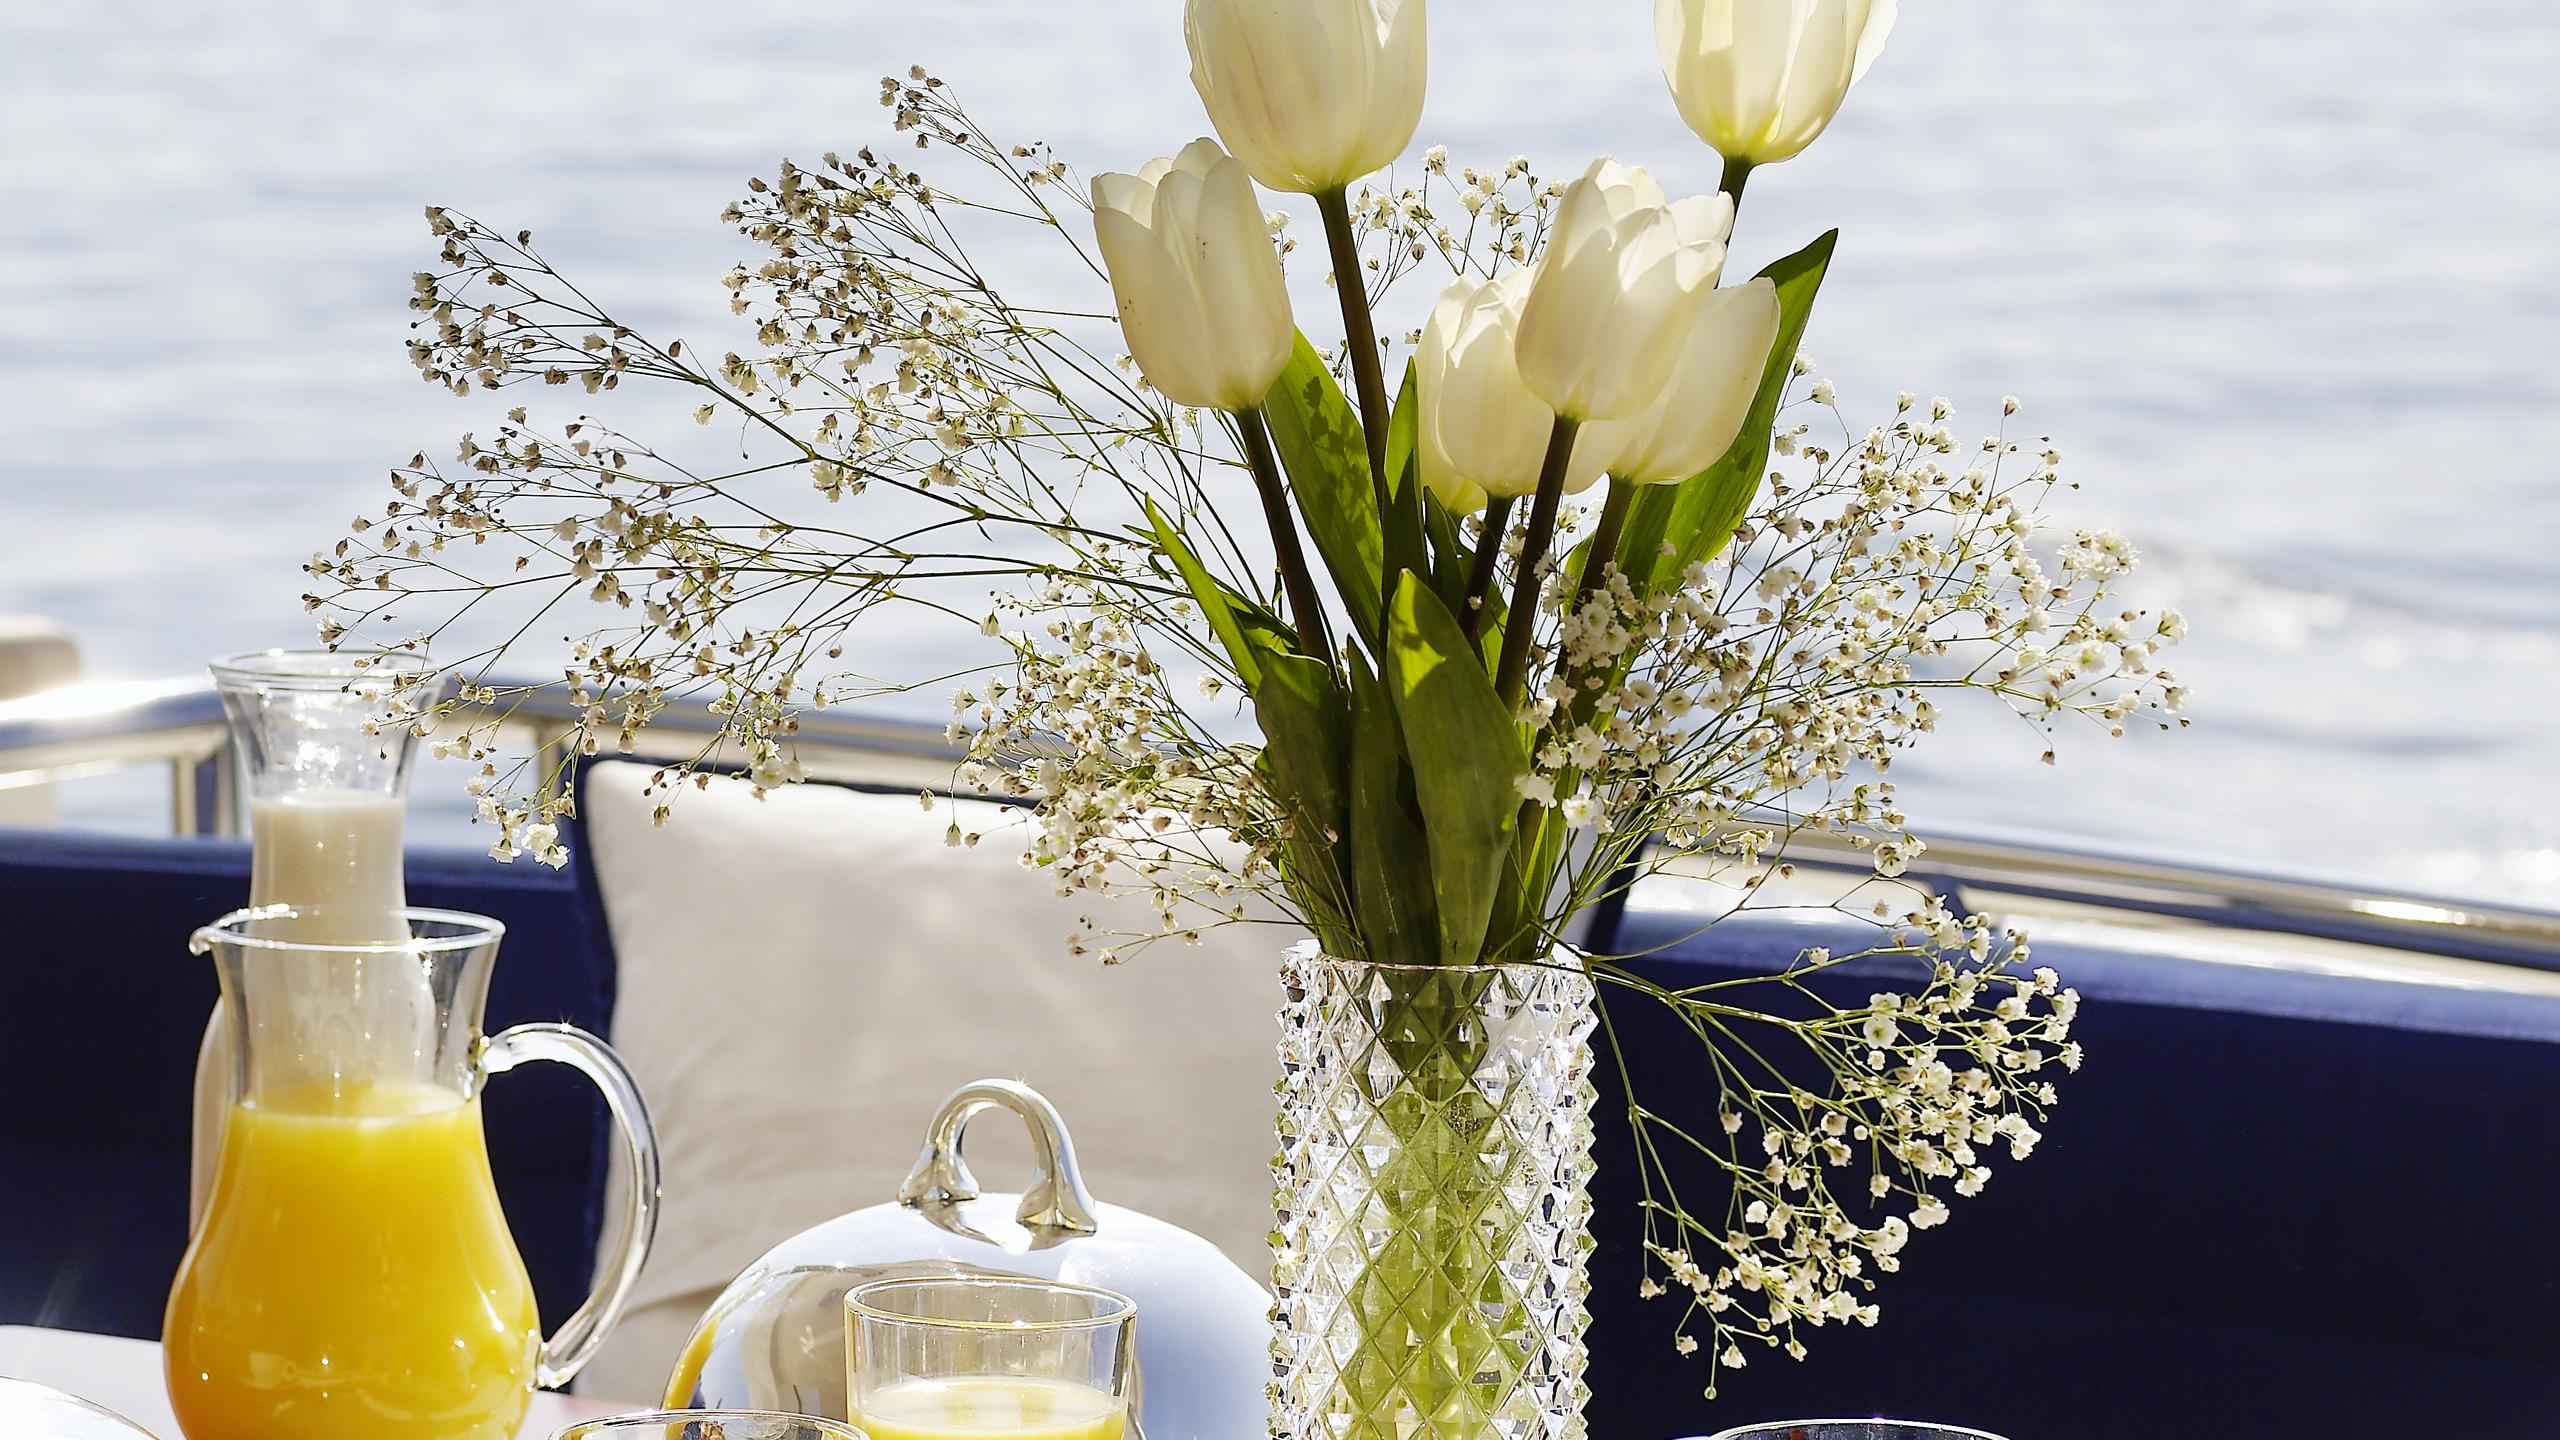 dream-b-yacht-aft-dining